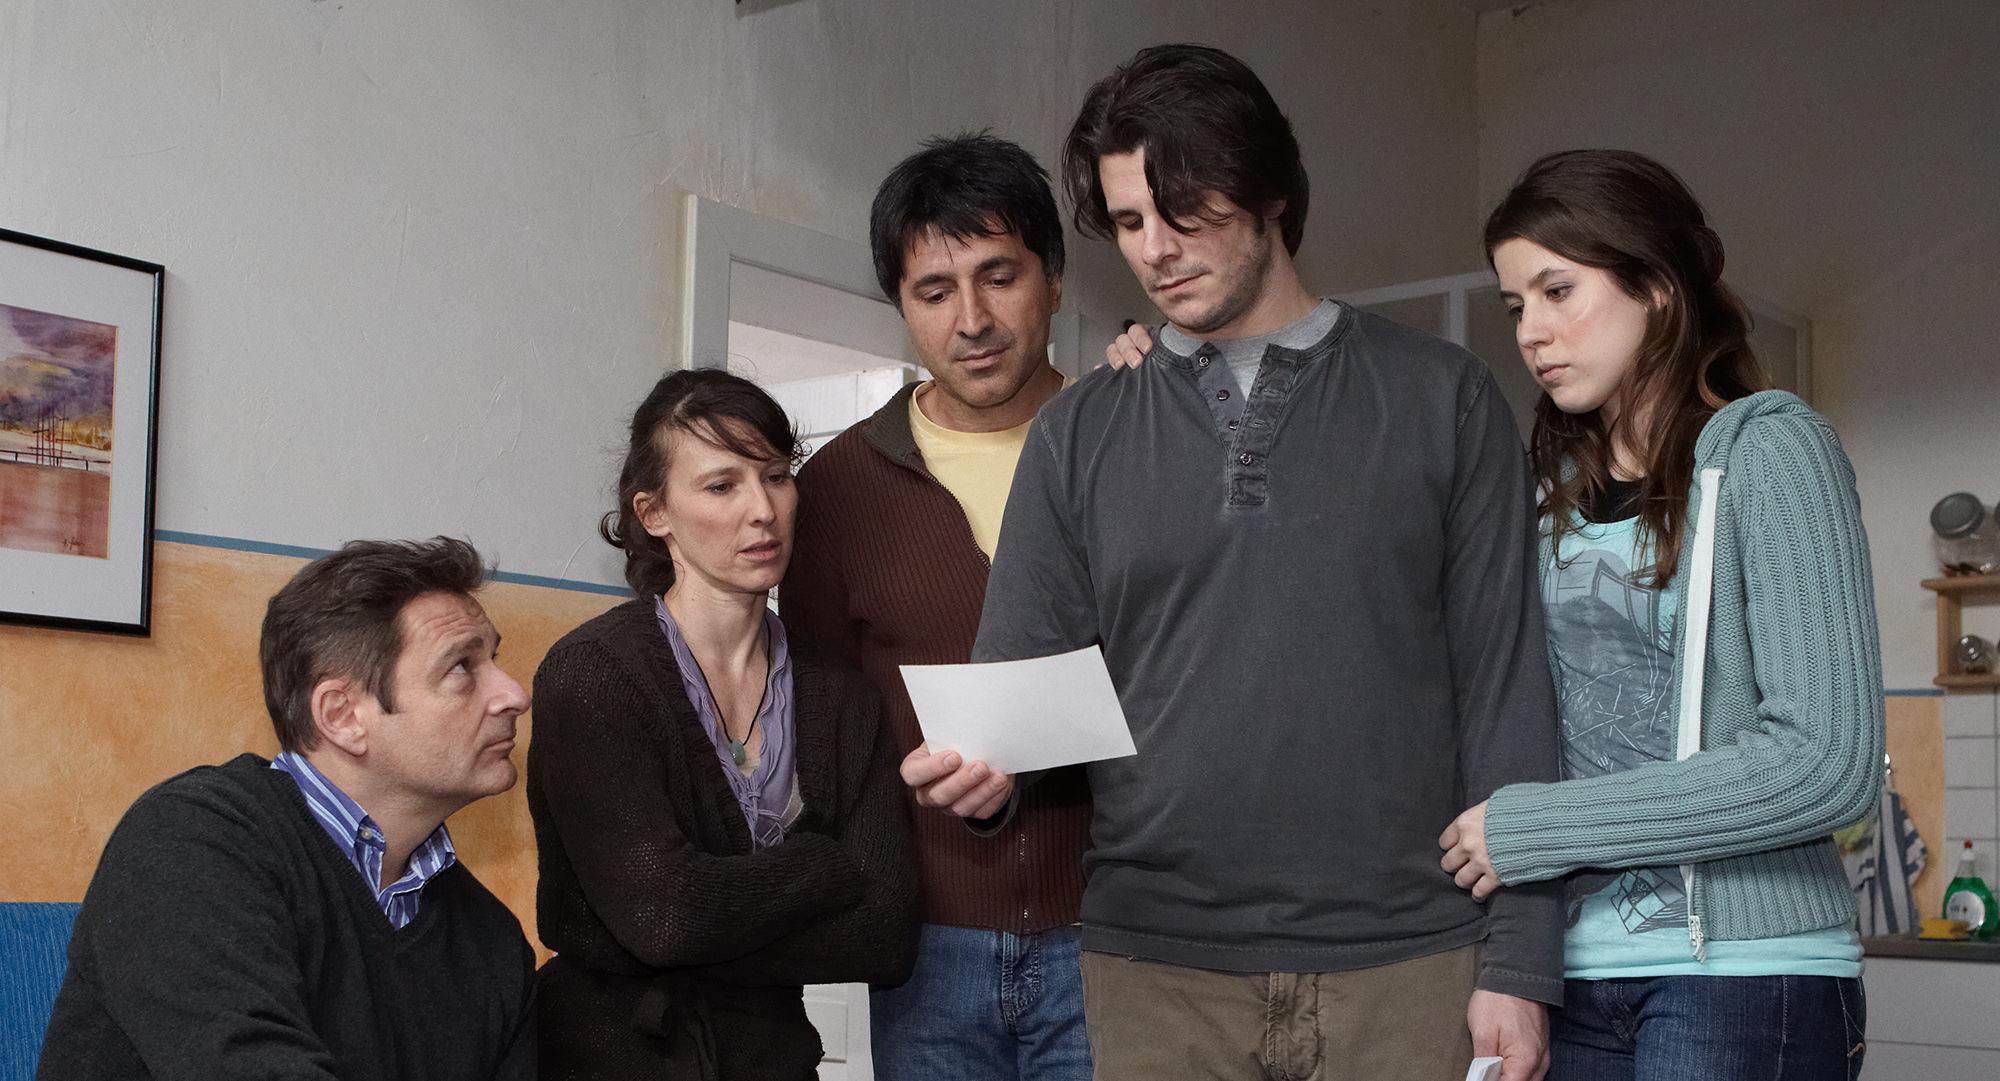 Andreas Steppan (August Horrowitz), Maria Köstlinger (Anna Schnabel), Haydar Zorlu (Seyfi Ülbül), Philip Leenders (James Horrowitz), Nora Heschl (Judith Schnabel)